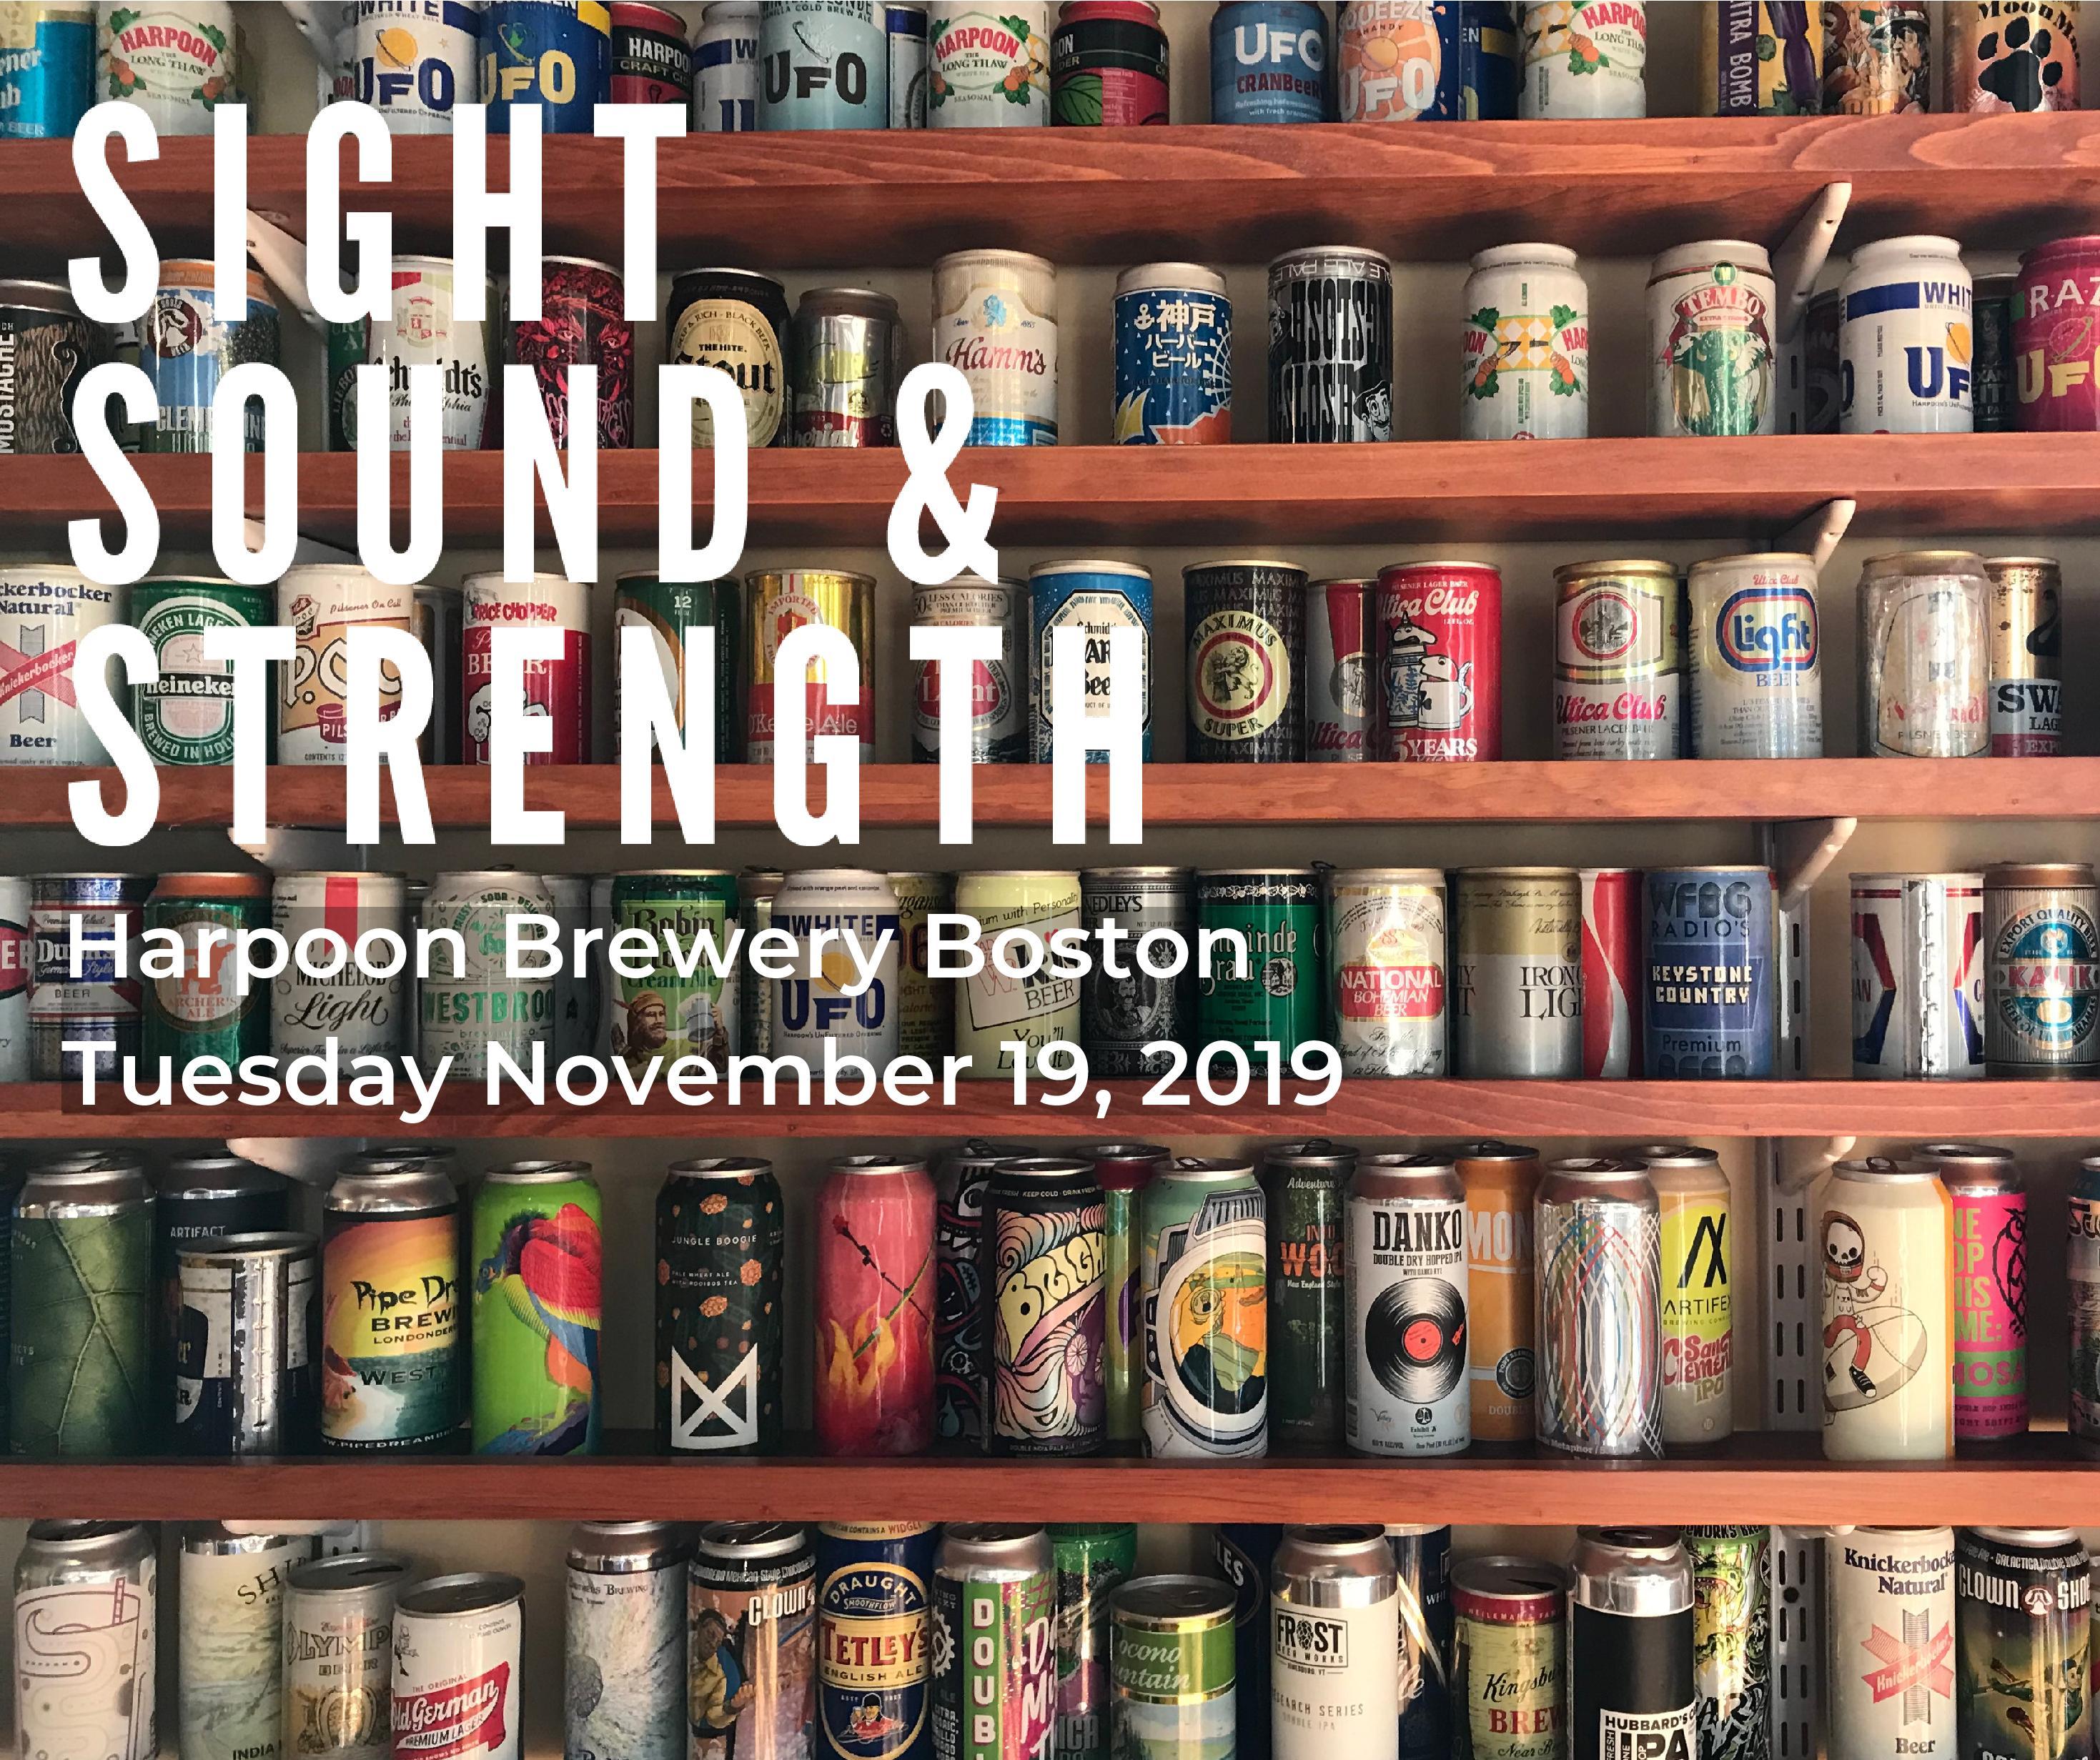 SSS Harpoon Brewery Boston